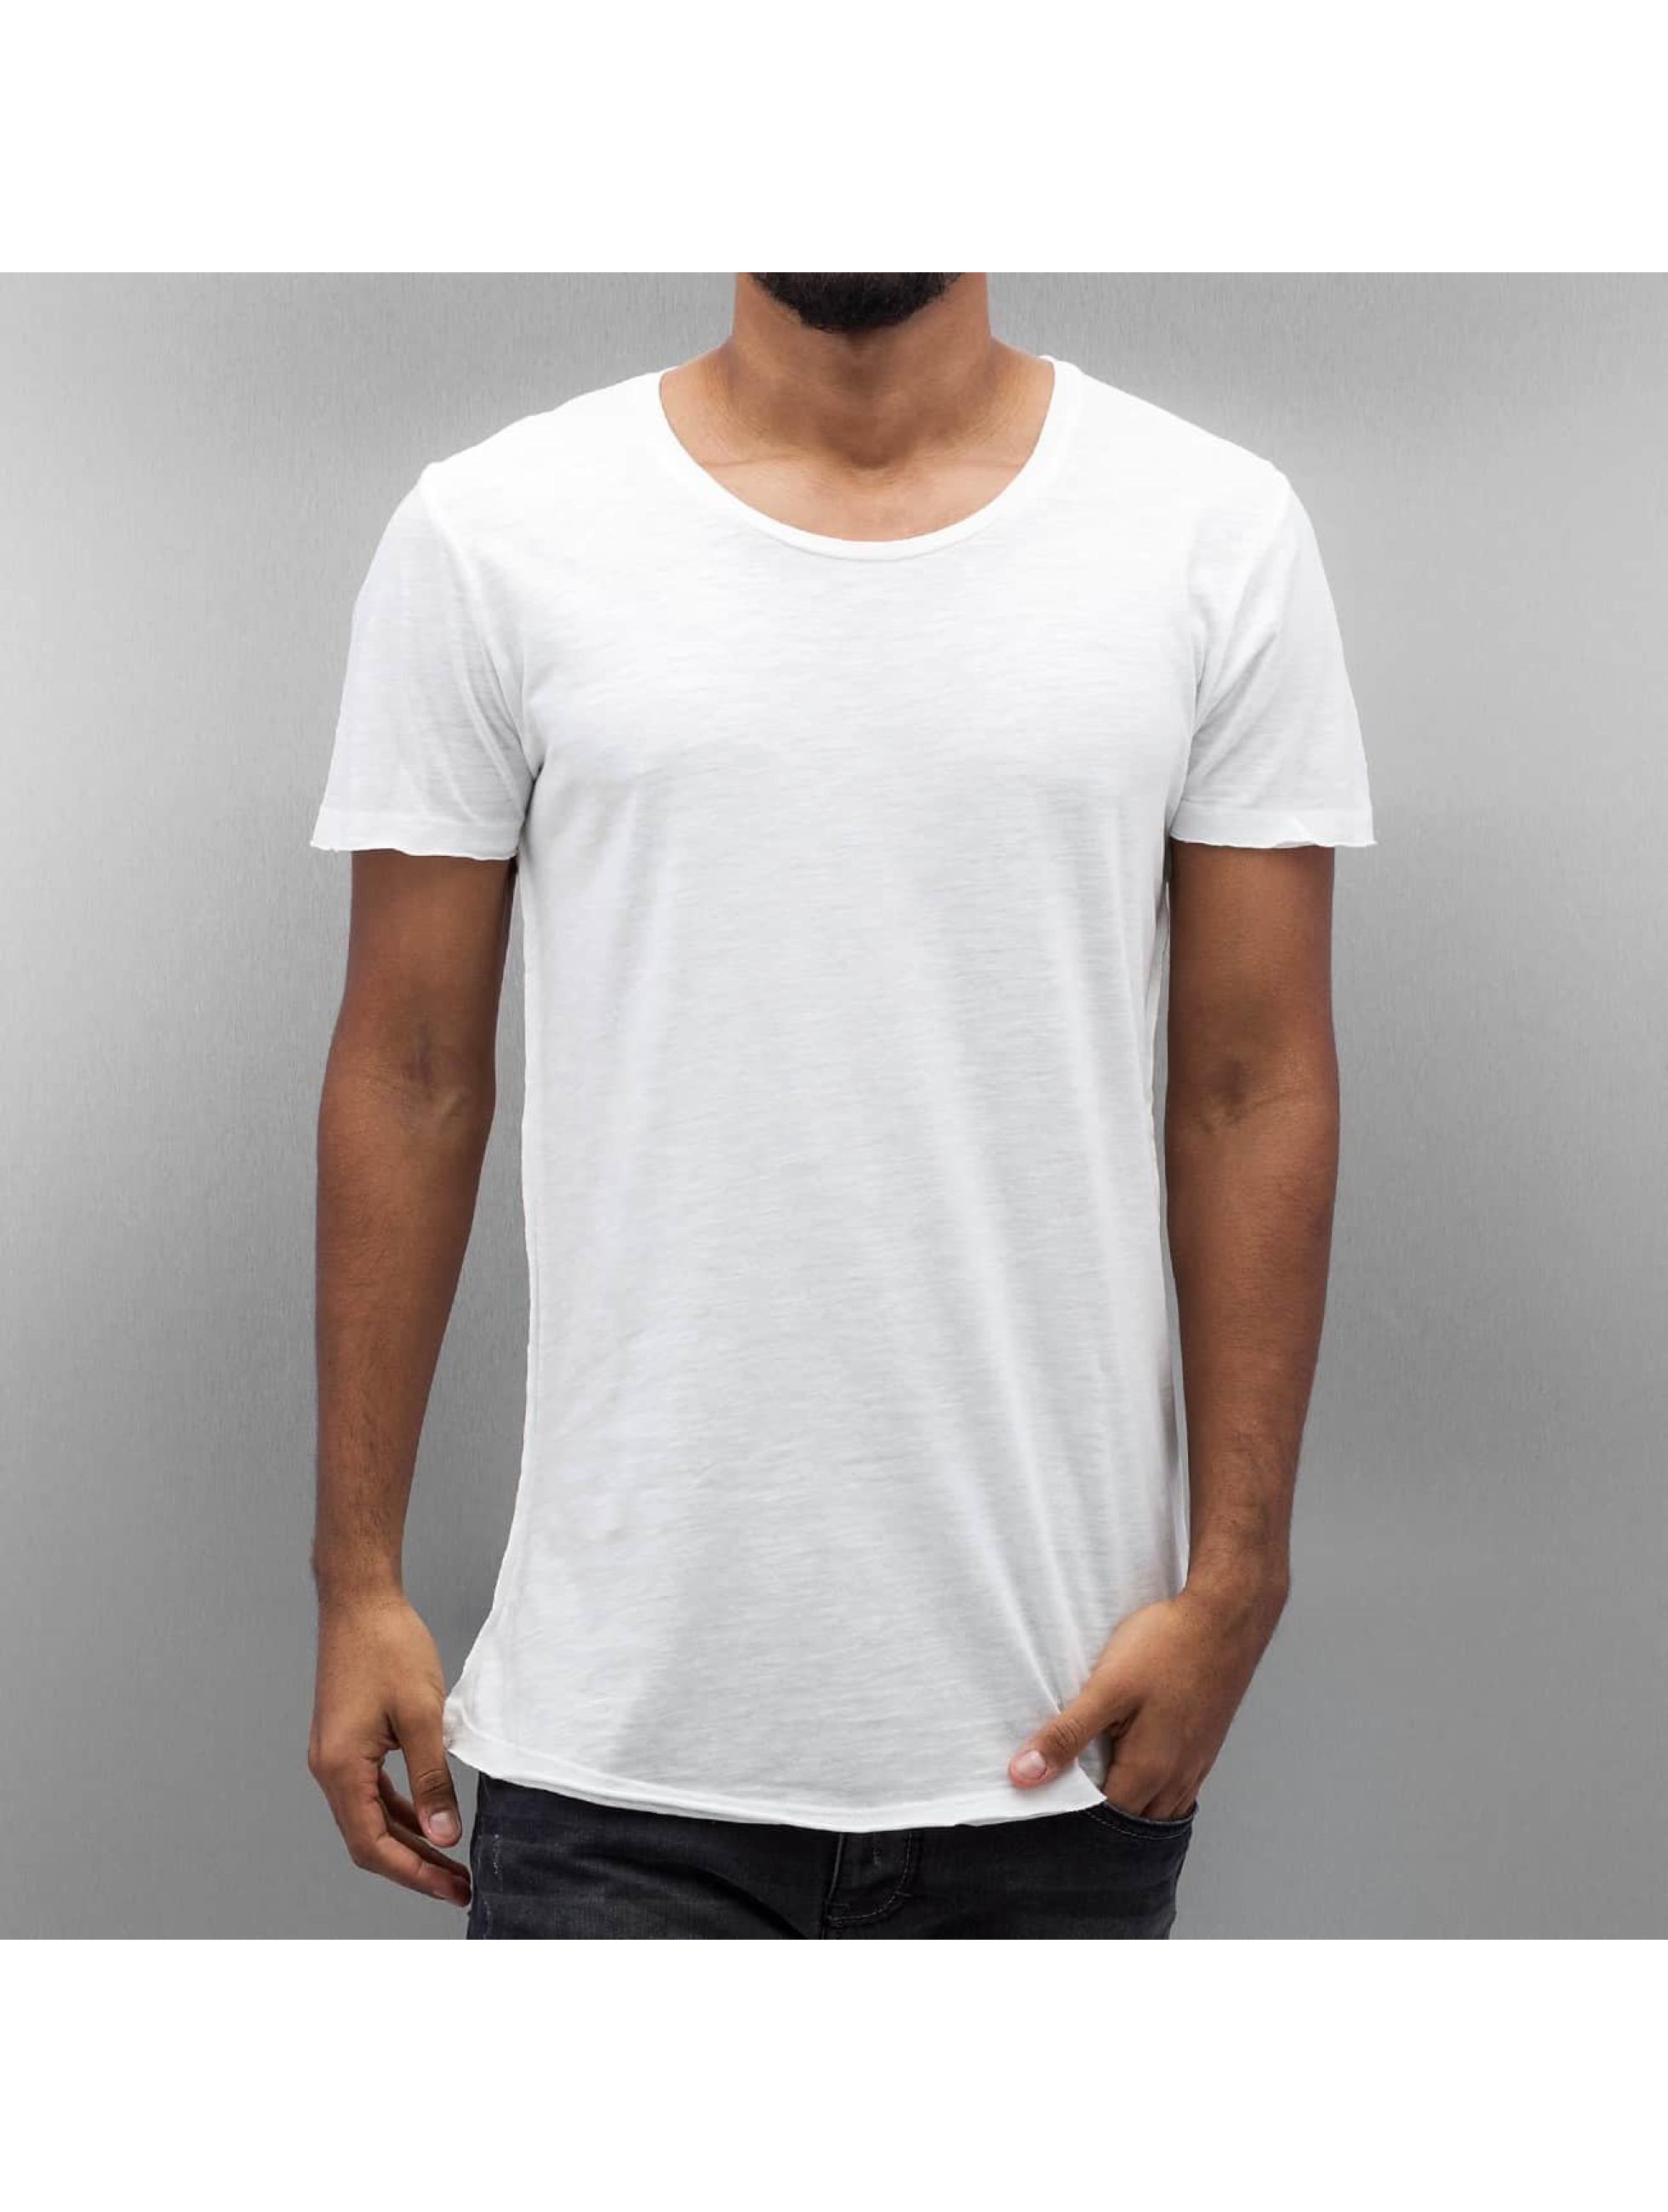 Jack & Jones T-Shirt jjorWallet in weiß